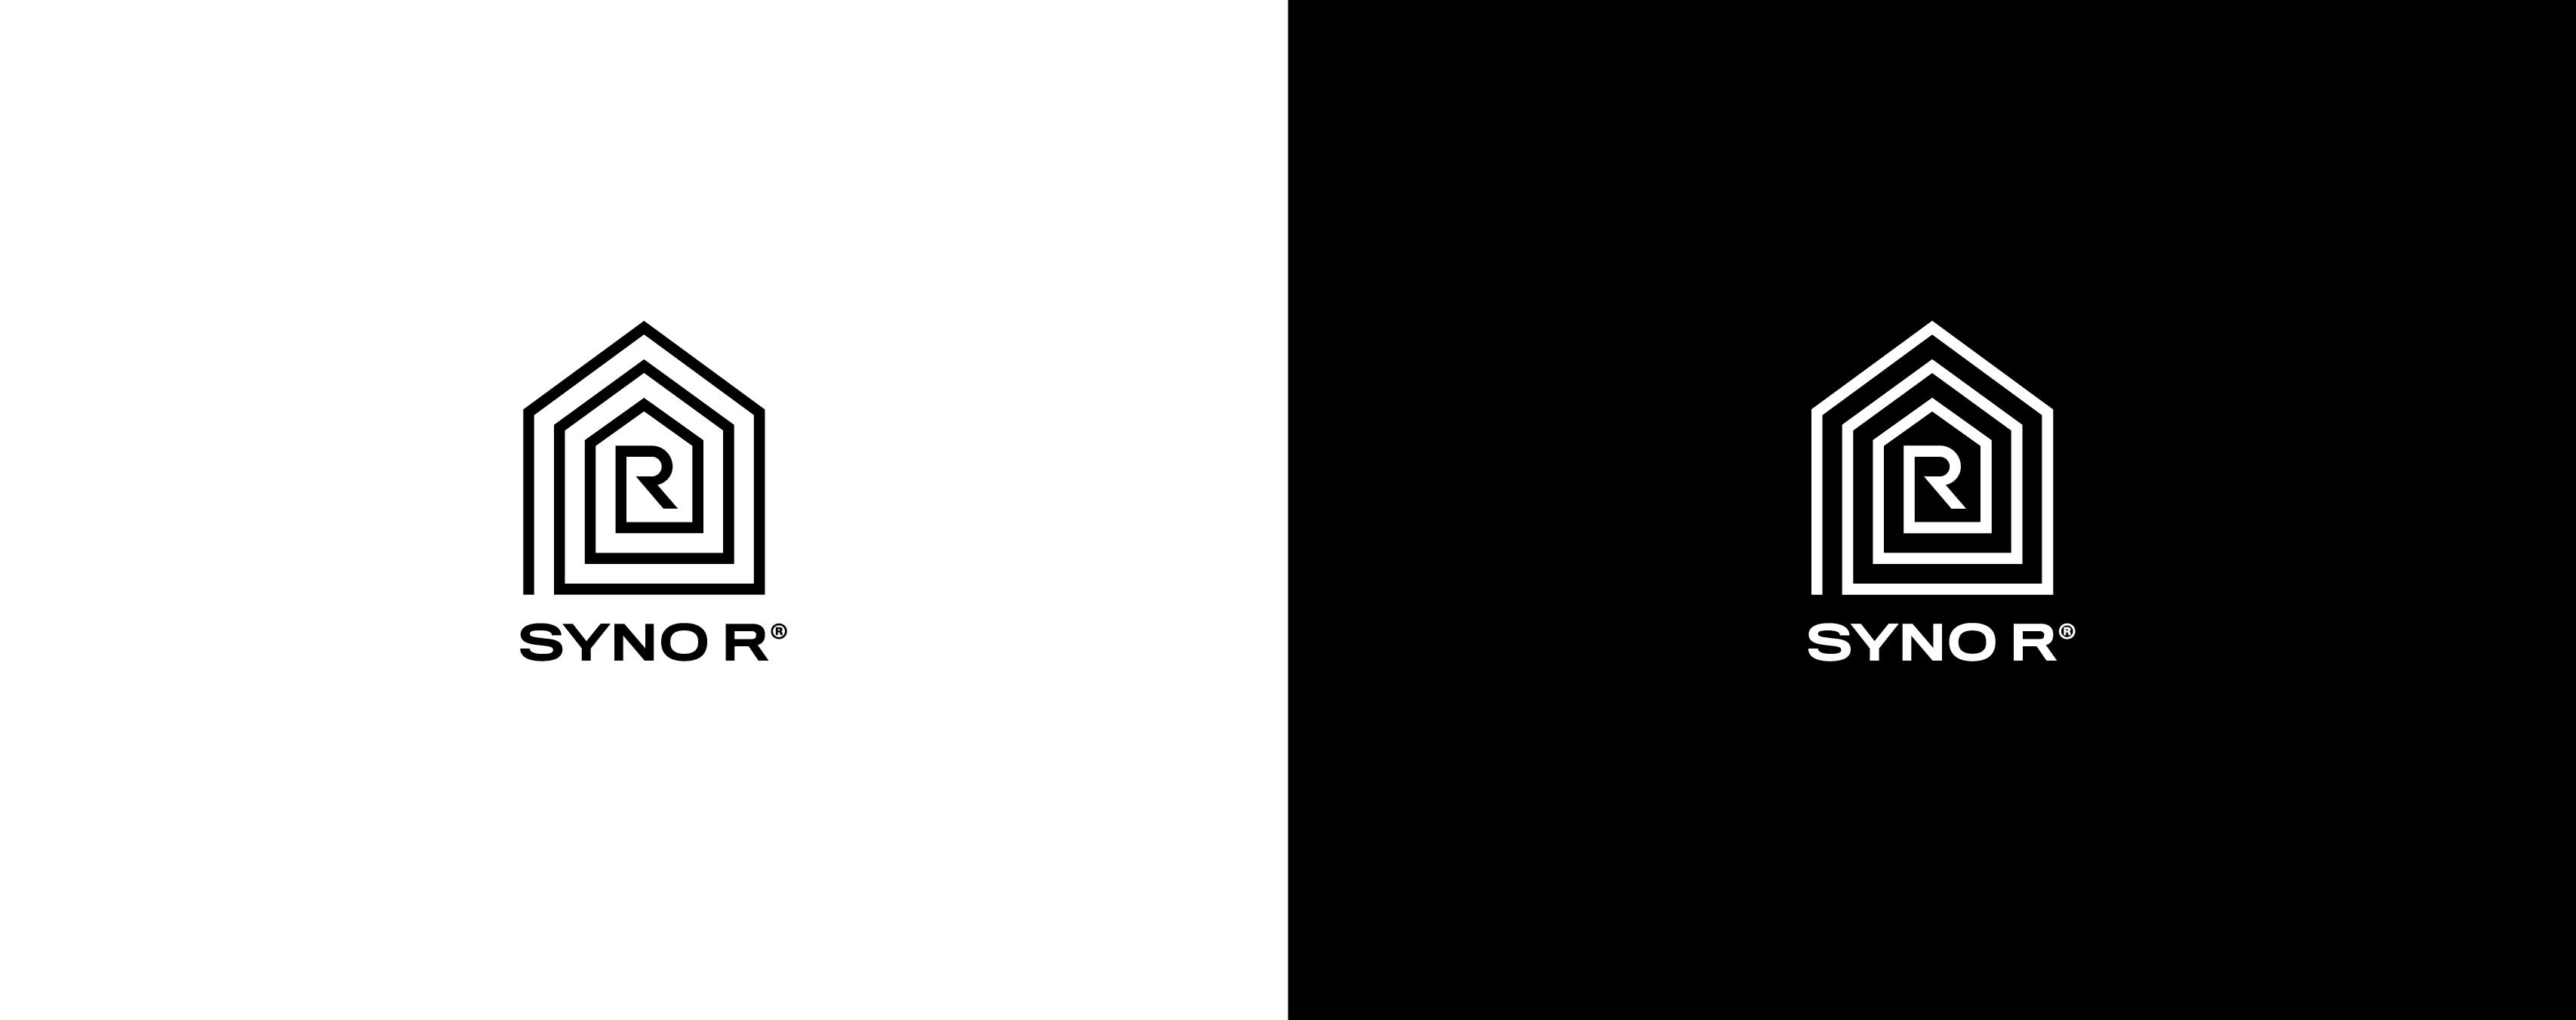 Logodesign für Syno R GmbH mit prägnantem Icon